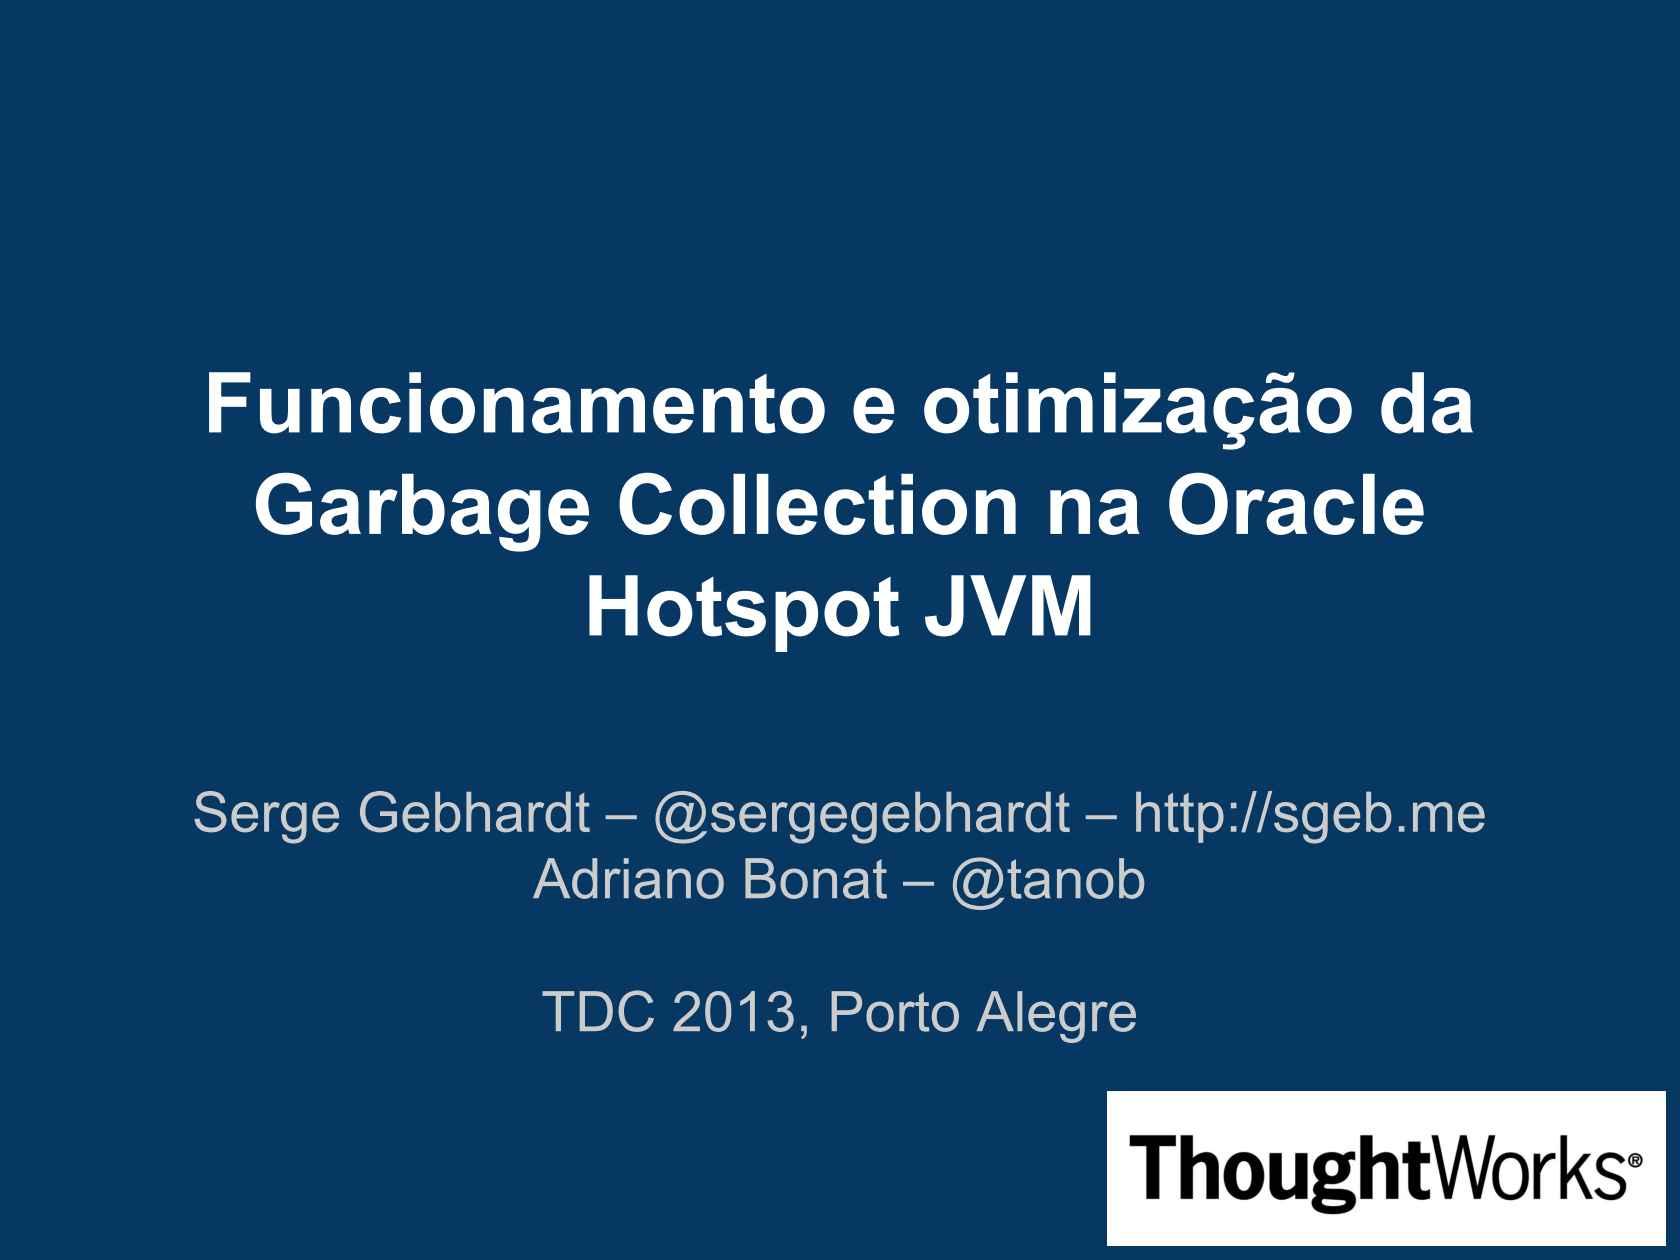 Funcionamento e otimização do Garbage Collector na Oracle HotSpot JVM